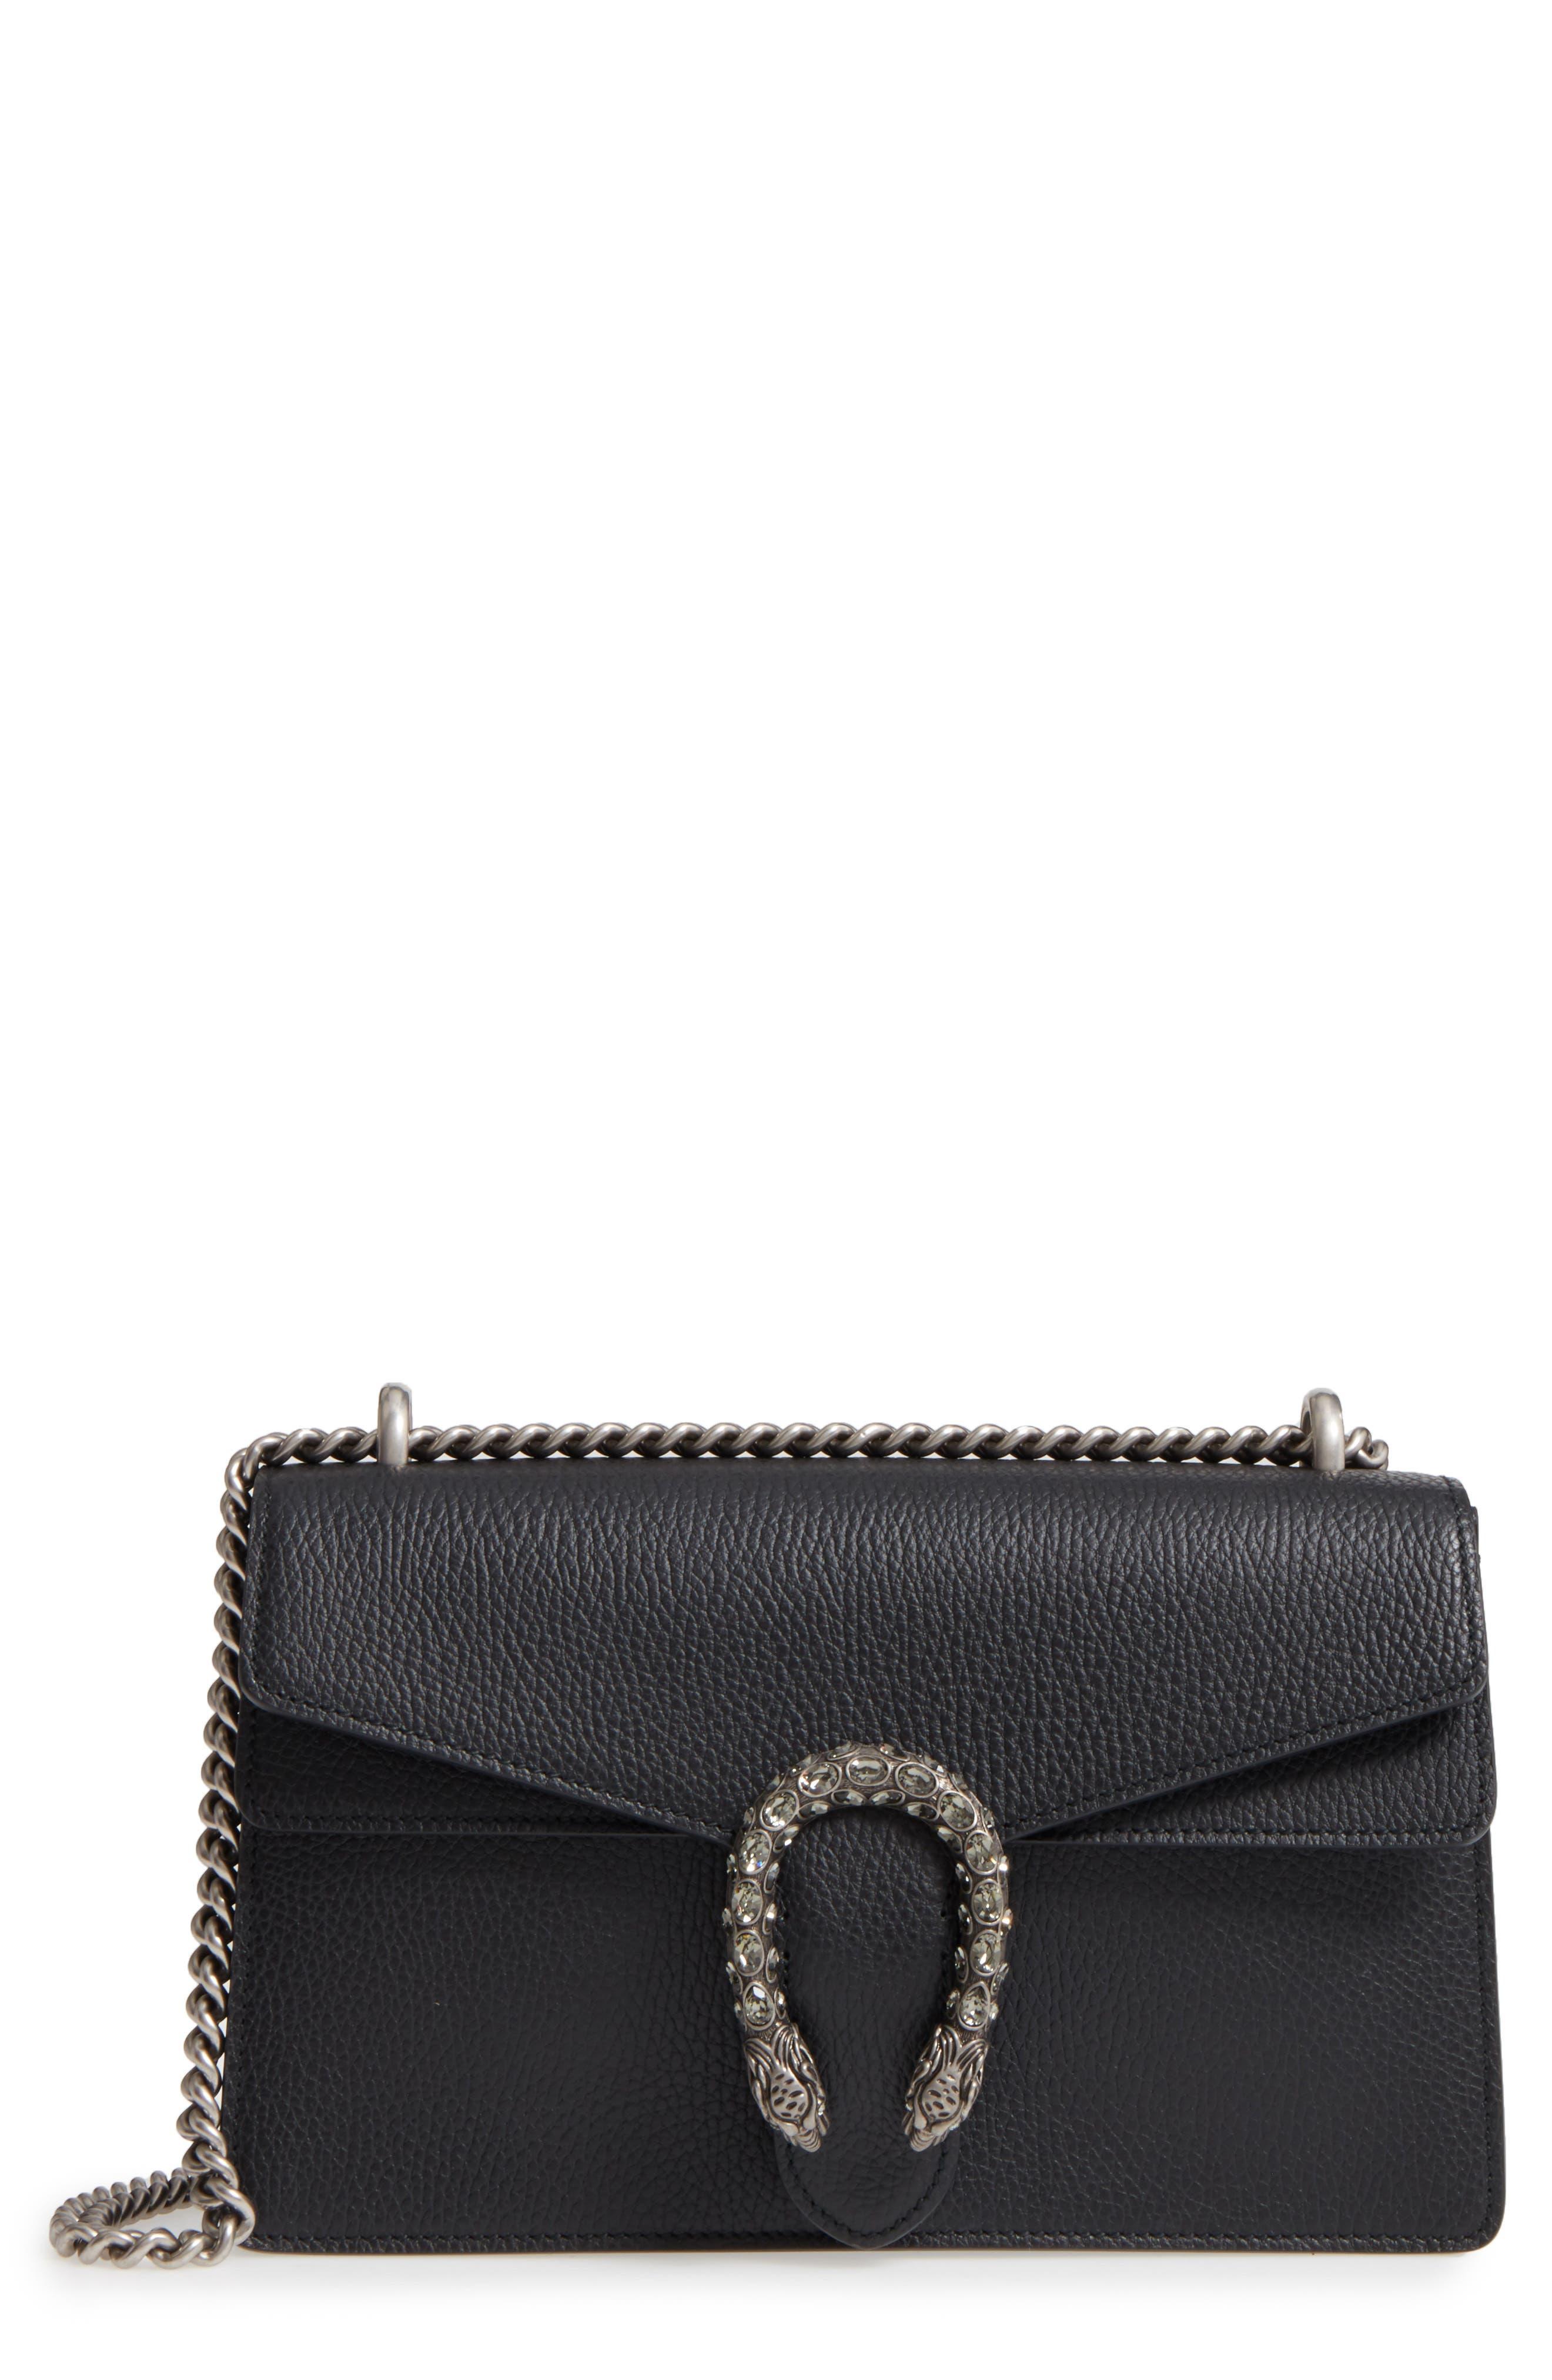 Small Dionysus Leather Shoulder Bag,                         Main,                         color, 8176 NERO/BLACK DIAMOND